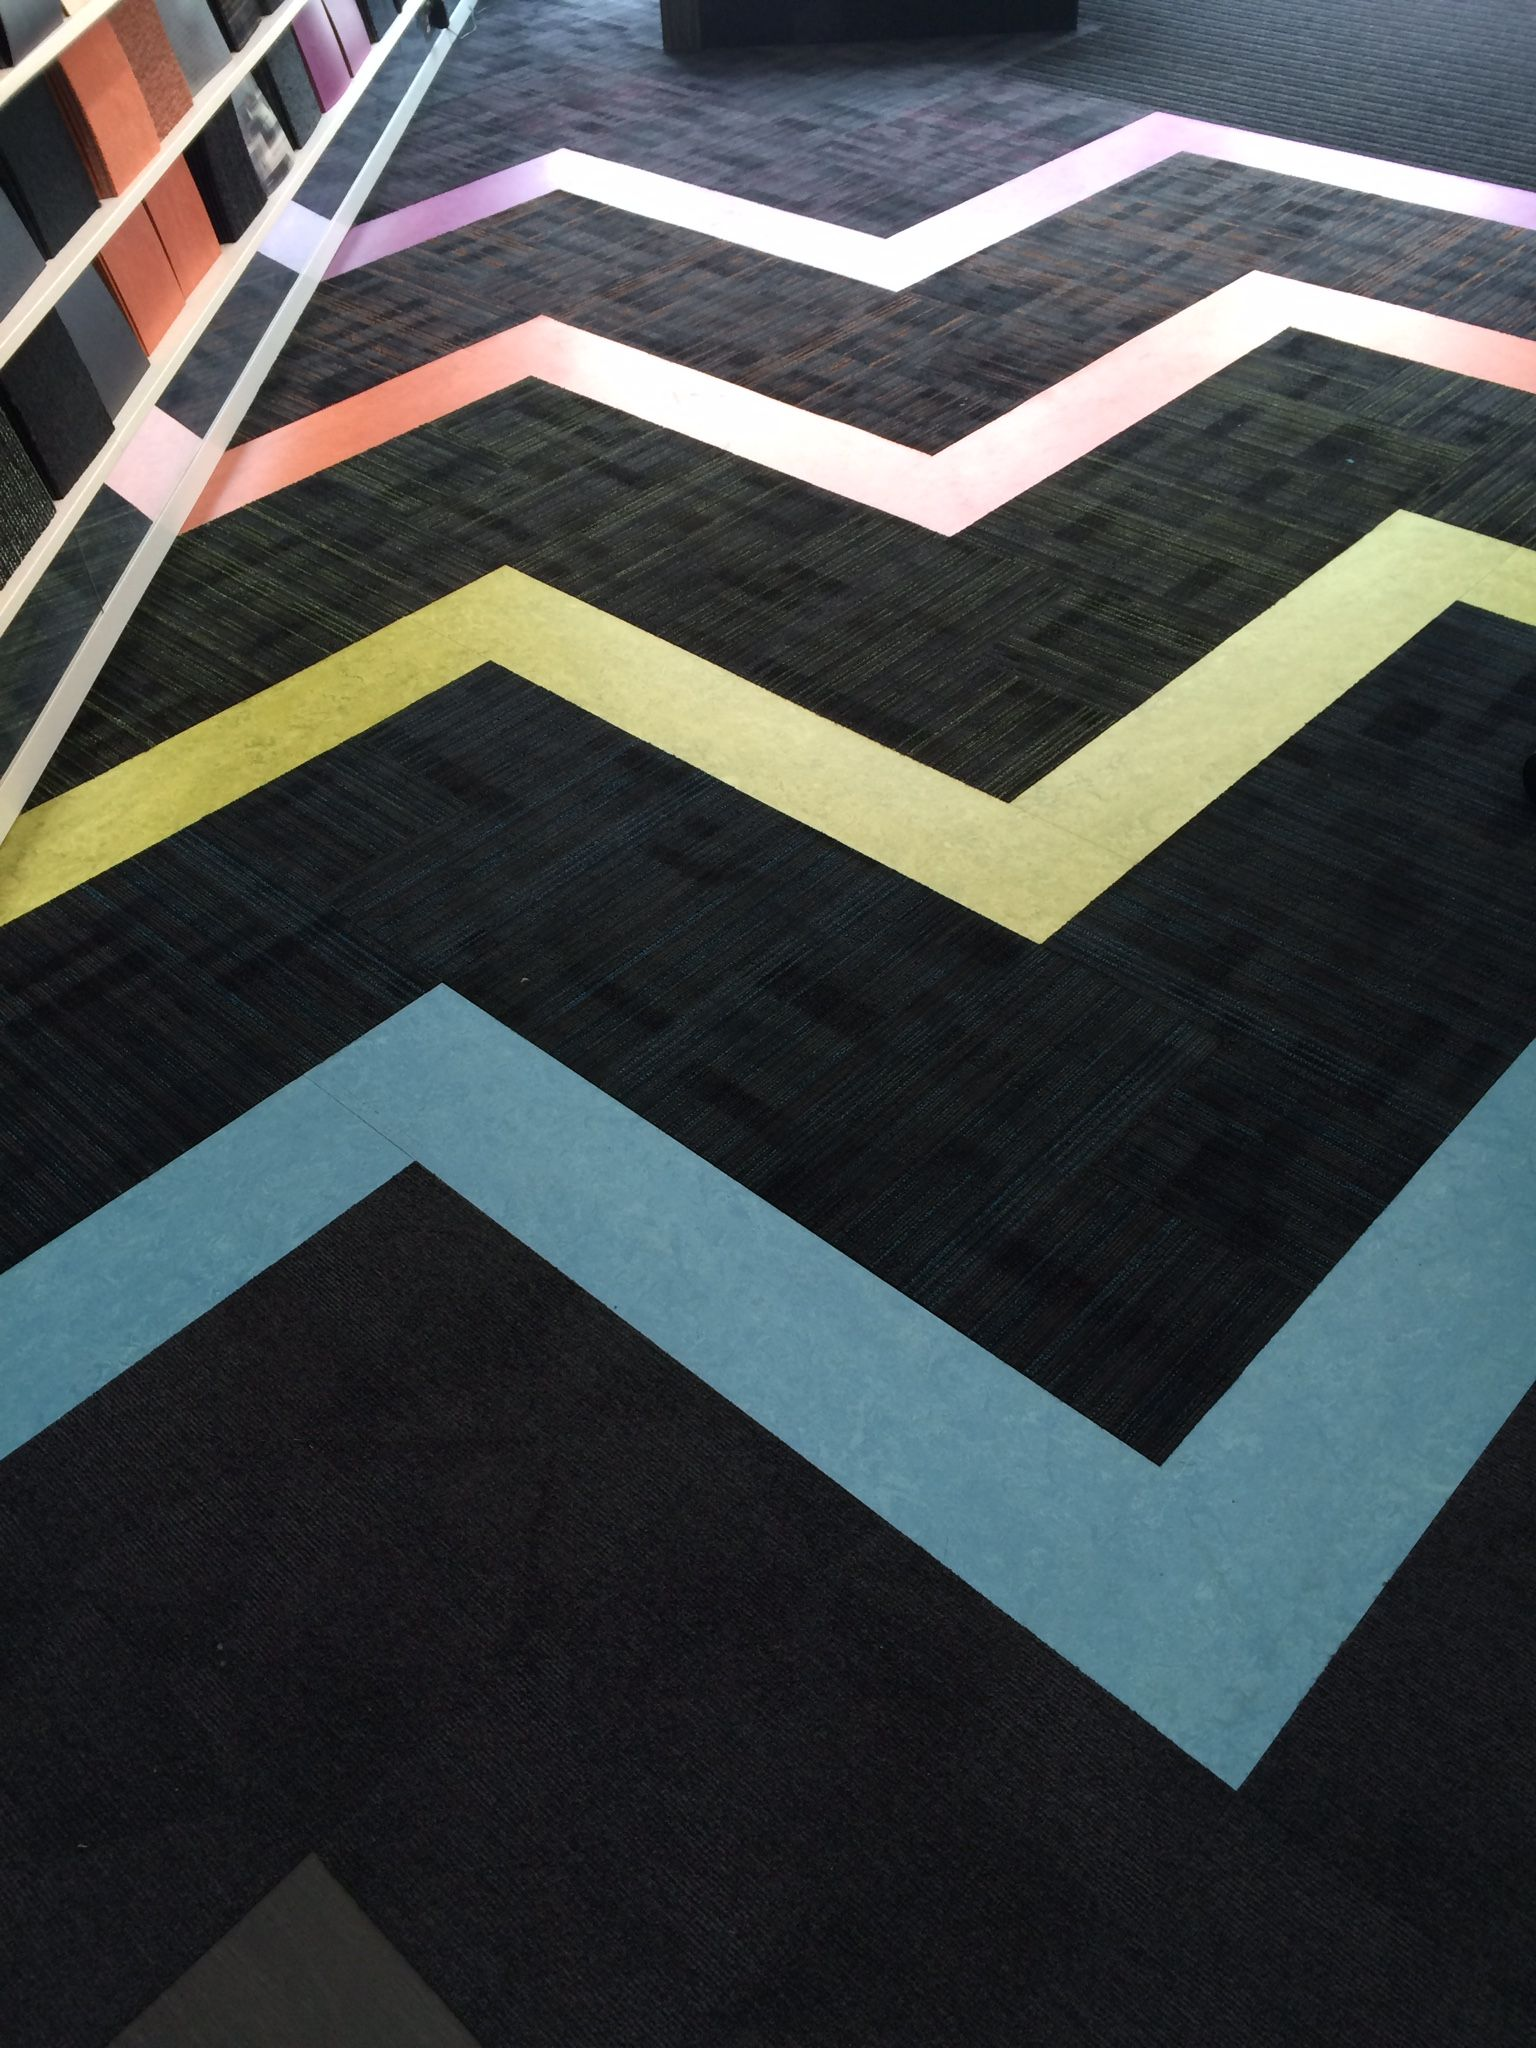 Commercial Flooring from Commercial flooring, Flooring